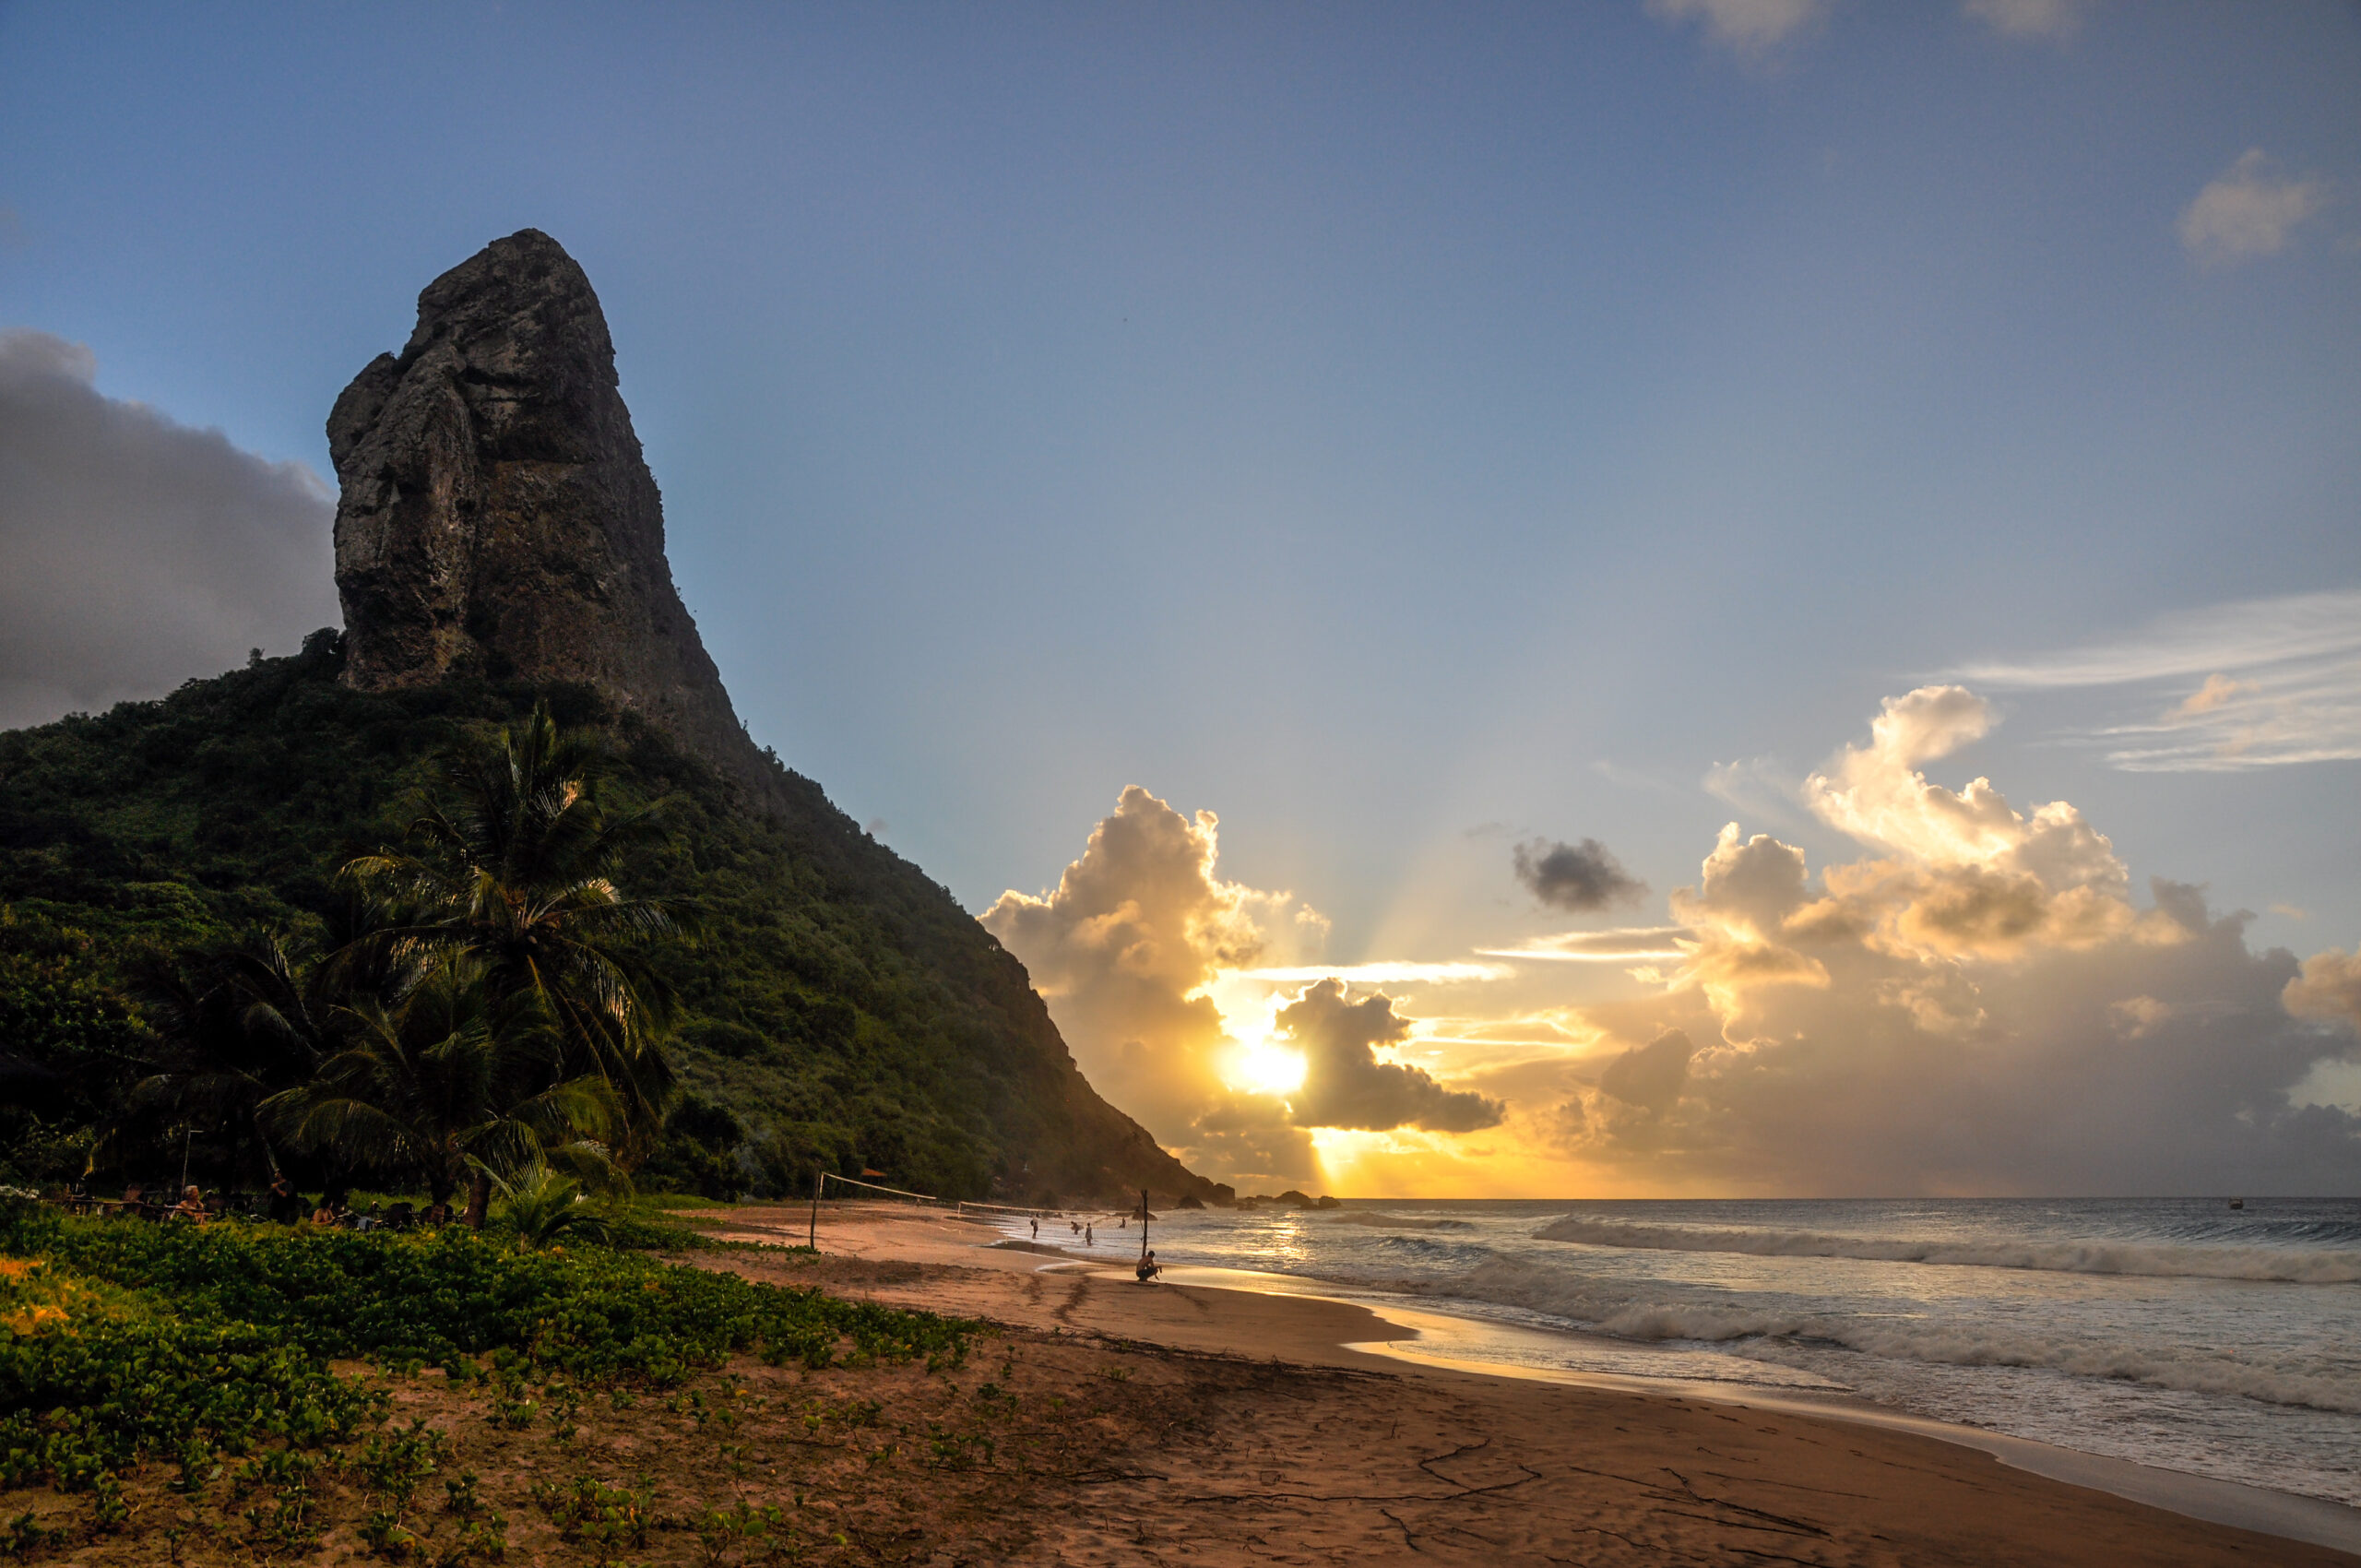 Sand beach and Morro do Pico at sunset, Fernando de Noronha island, Pernambuco (Brazil)